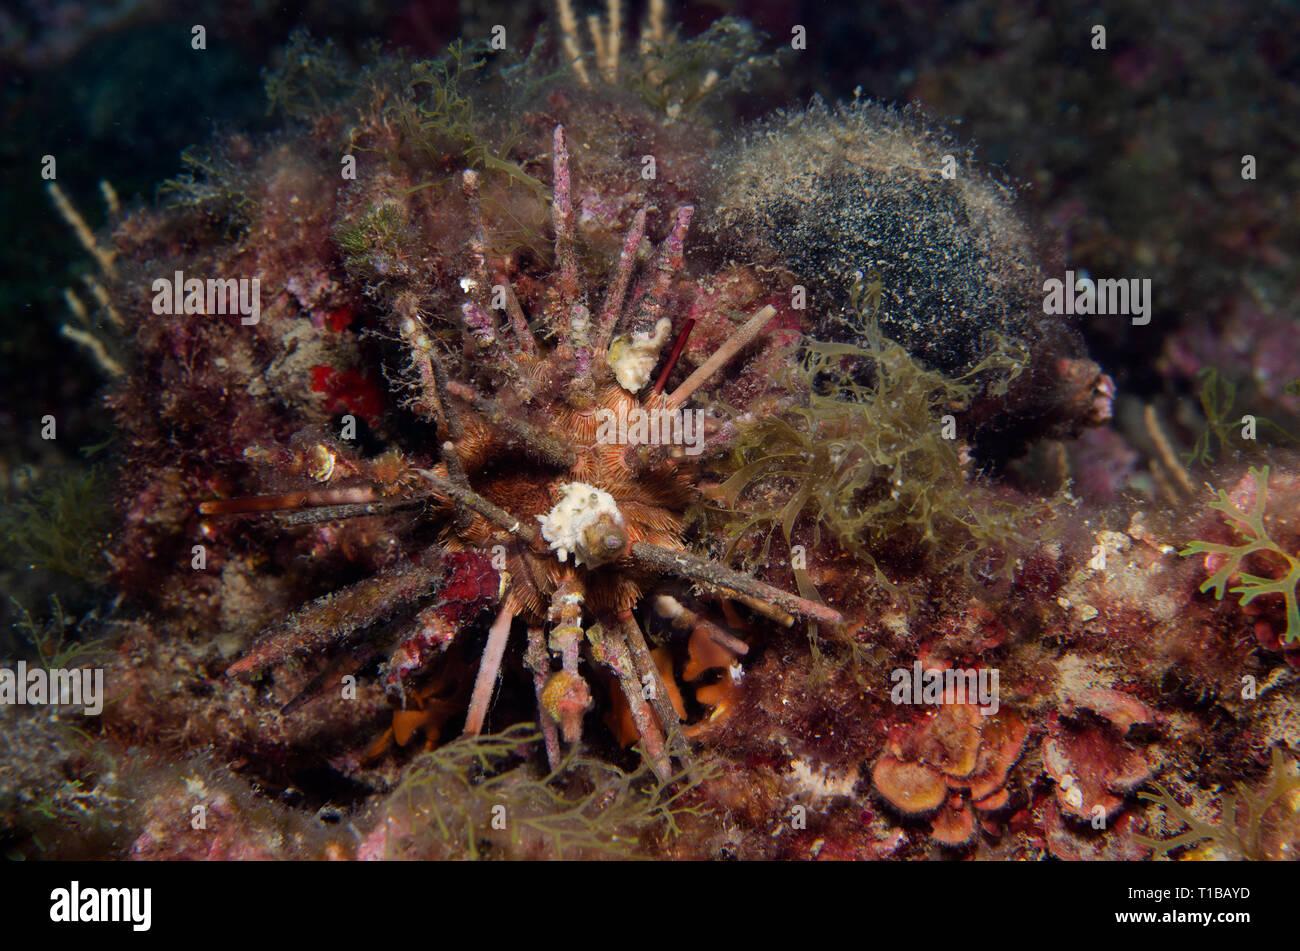 Red Lance Urchin, Stylocidaris affinis, Cidaridae, Tor Paterno Marine Protected Area, Rome, Italy, Mediterranean Sea - Stock Image